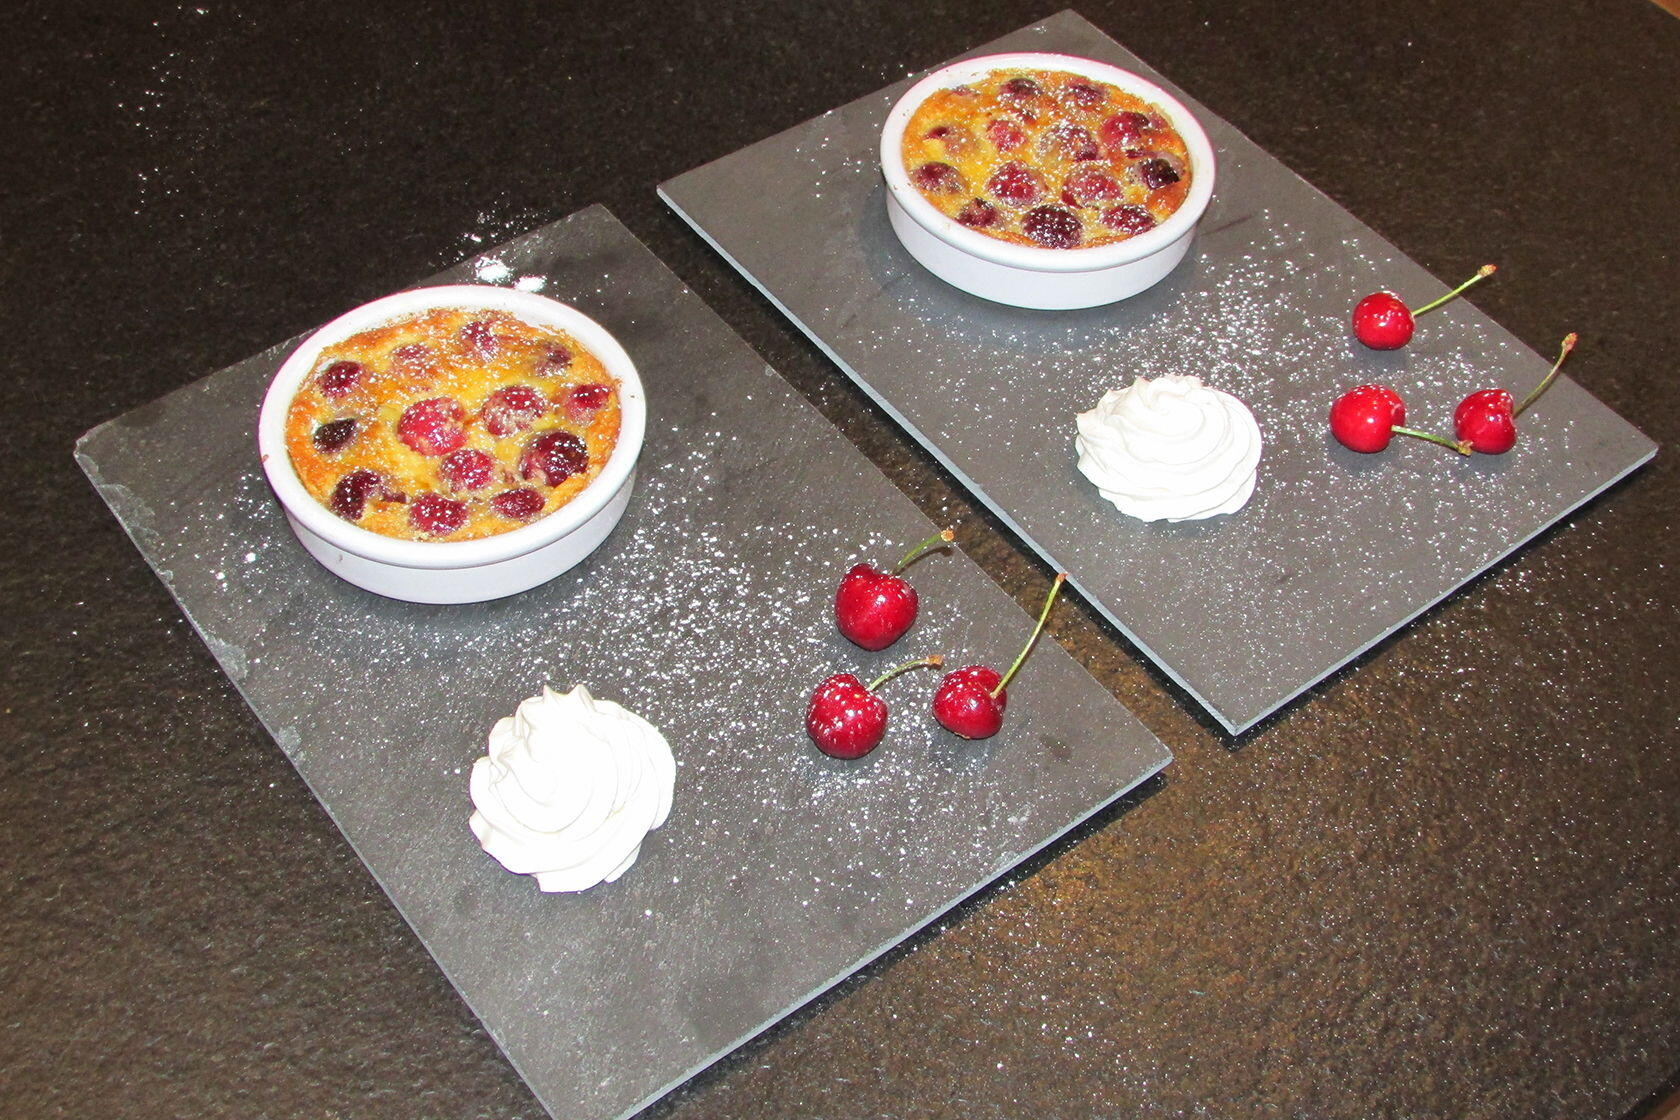 Cherry and Almond Clafoutis @masdaugustine